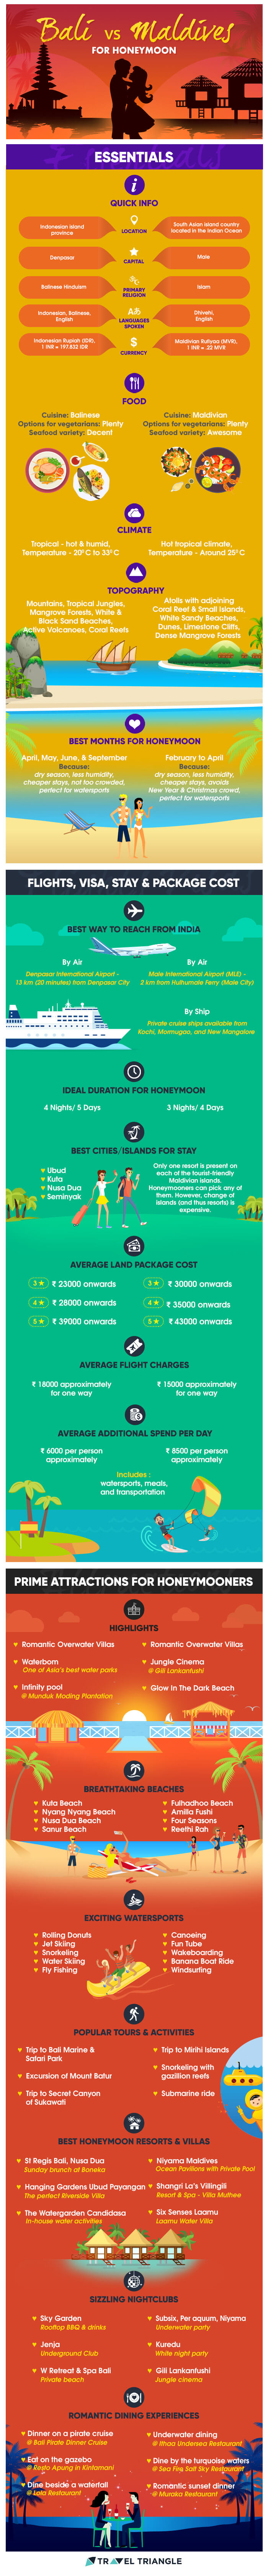 The Perfect Honeymoon Destination: Choosing Between Bali and Maldives - Infographic